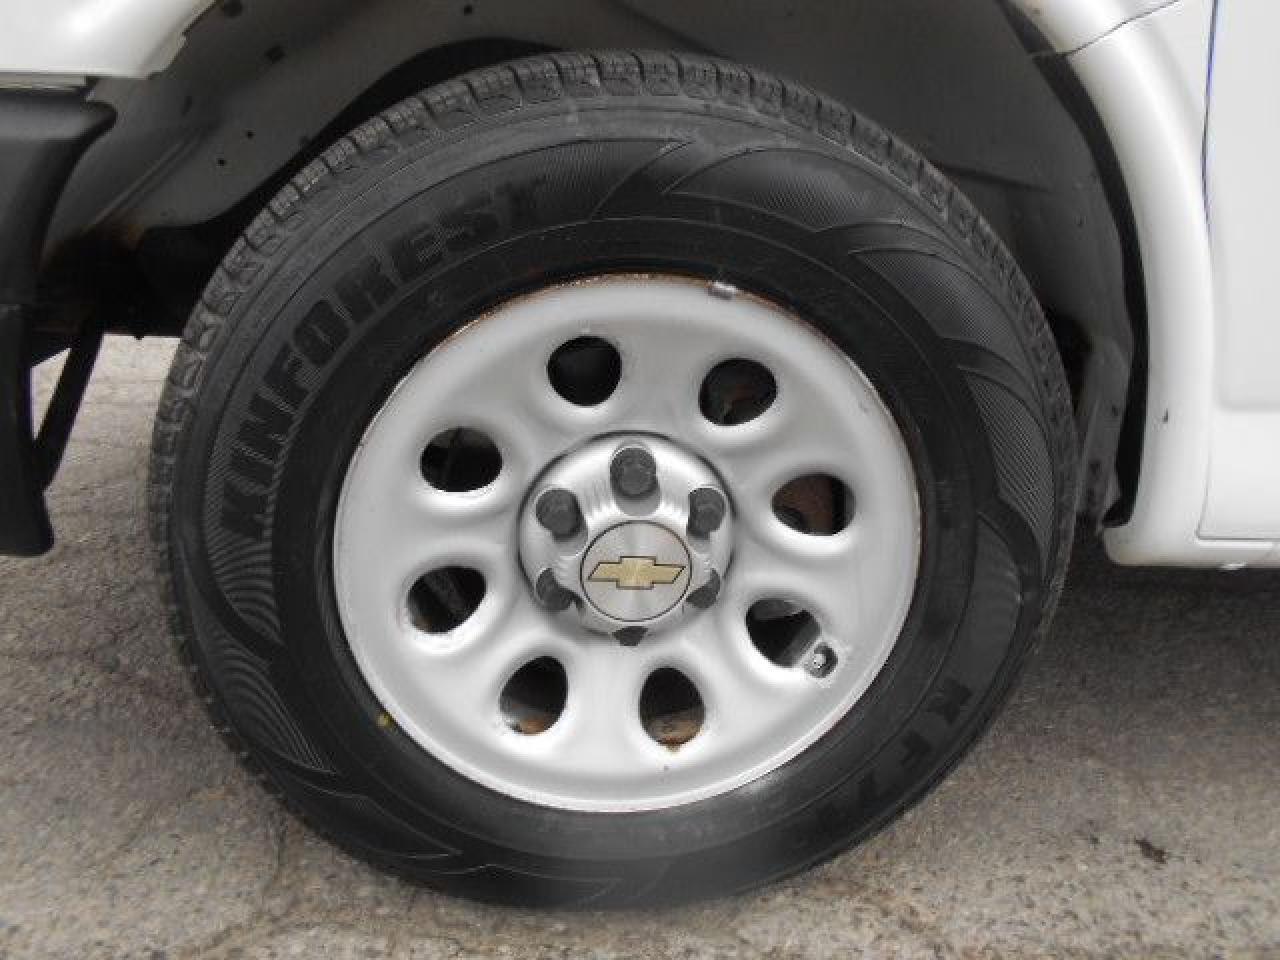 2010 Chevrolet Express 1500 CARGO 4.3L V6 A/C Divider Certified ONLY 136,000Km